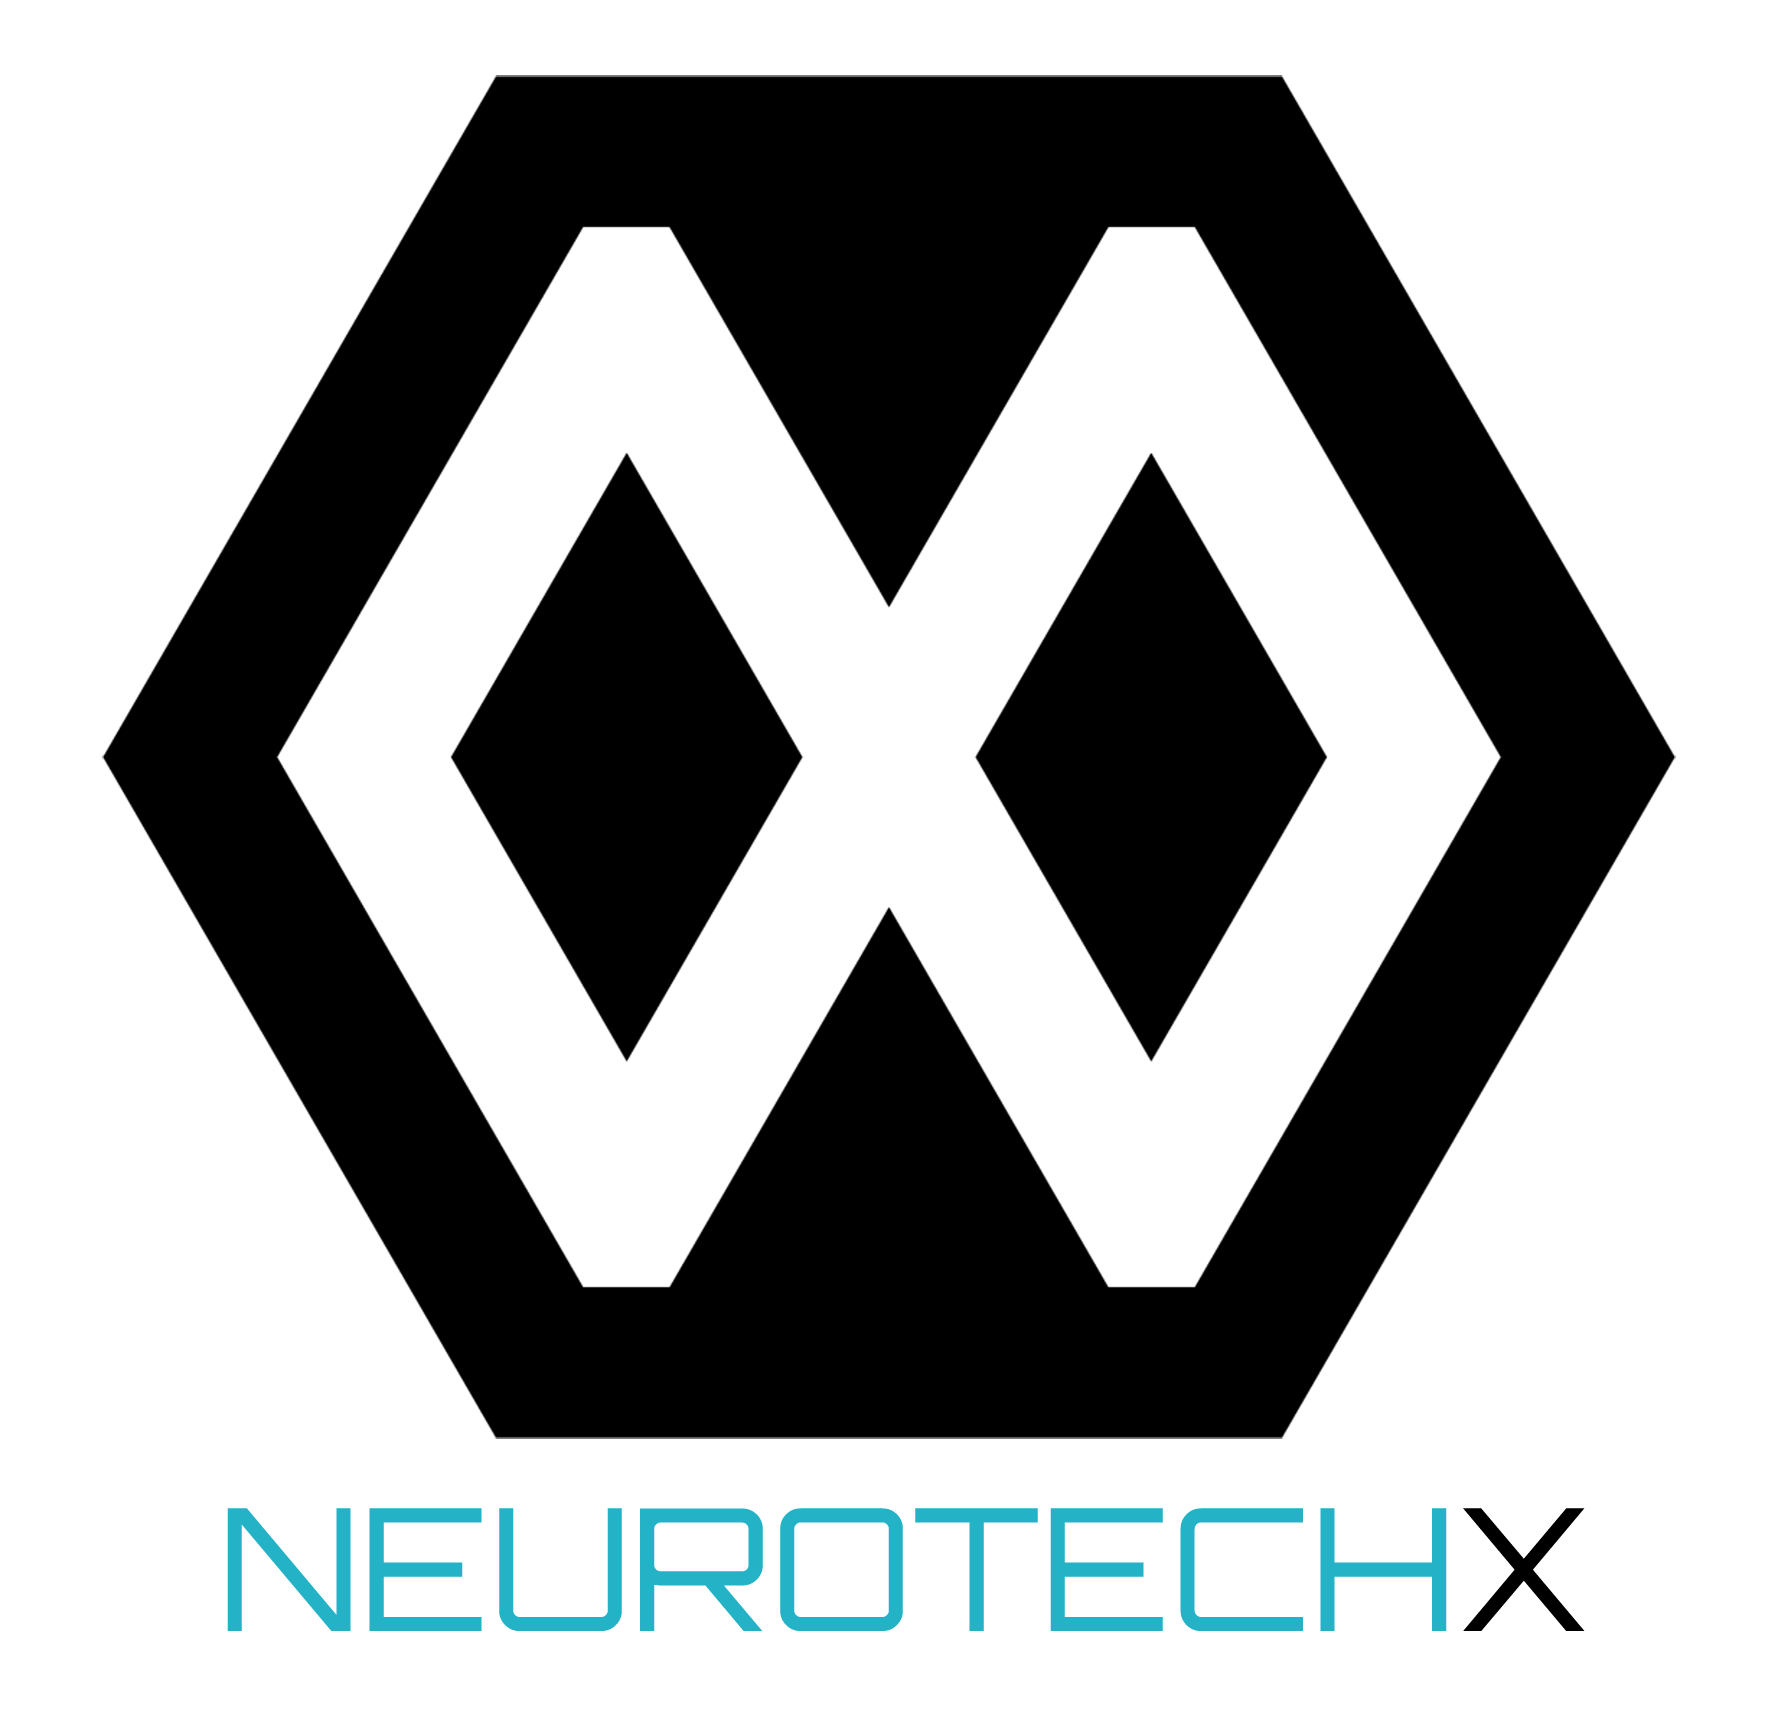 NeuroTechX